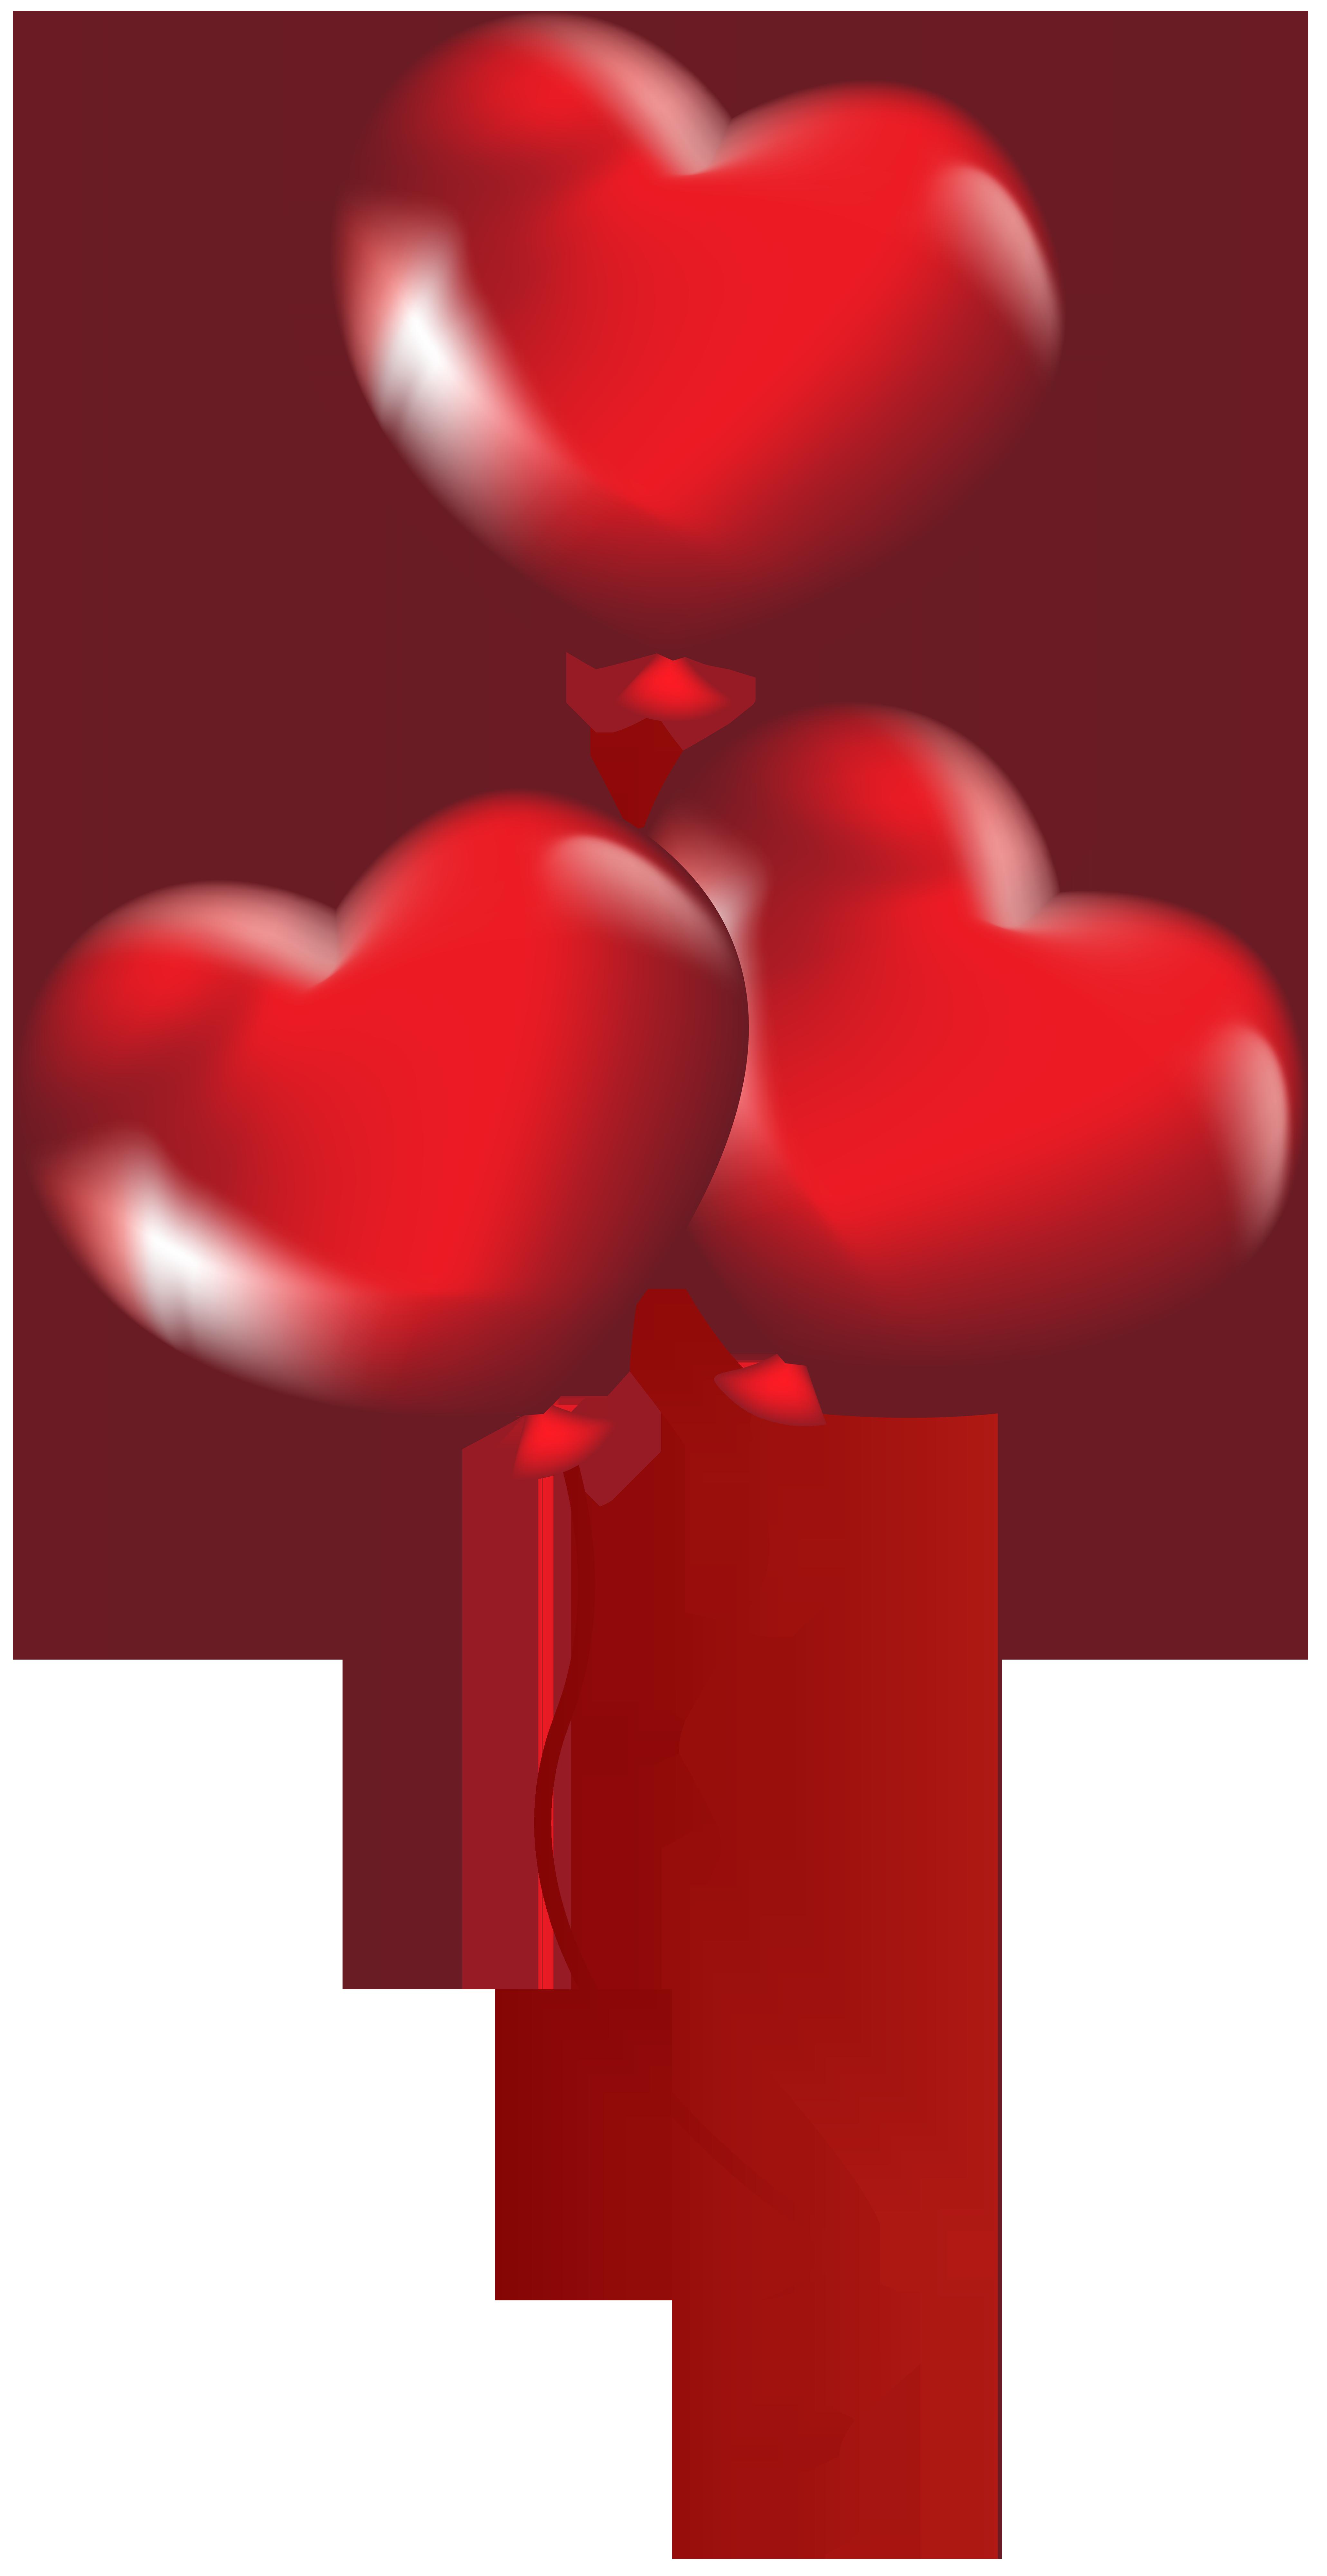 Heart balloons transparent png. Clipart hearts balloon